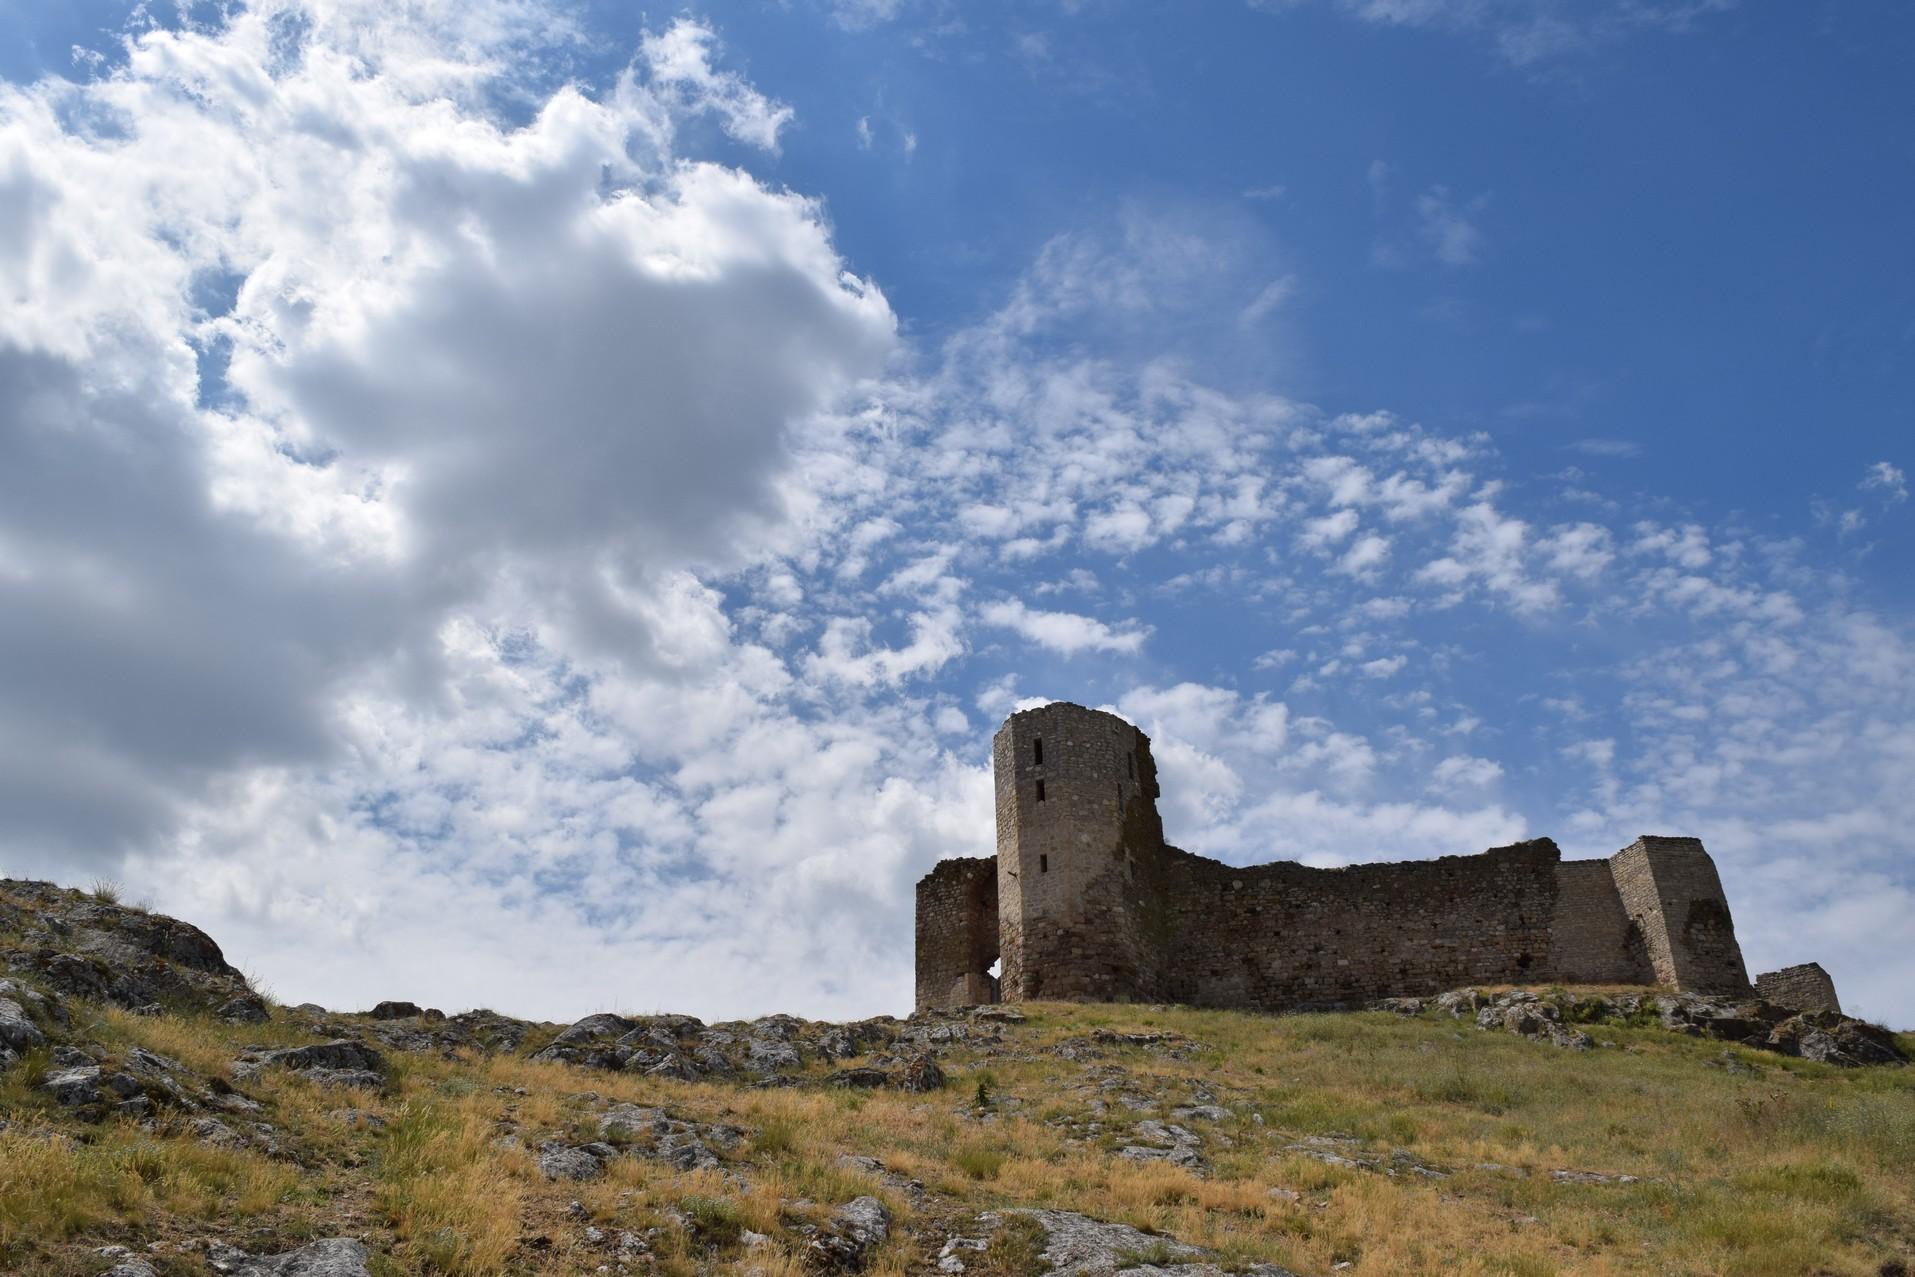 Enisala citadel